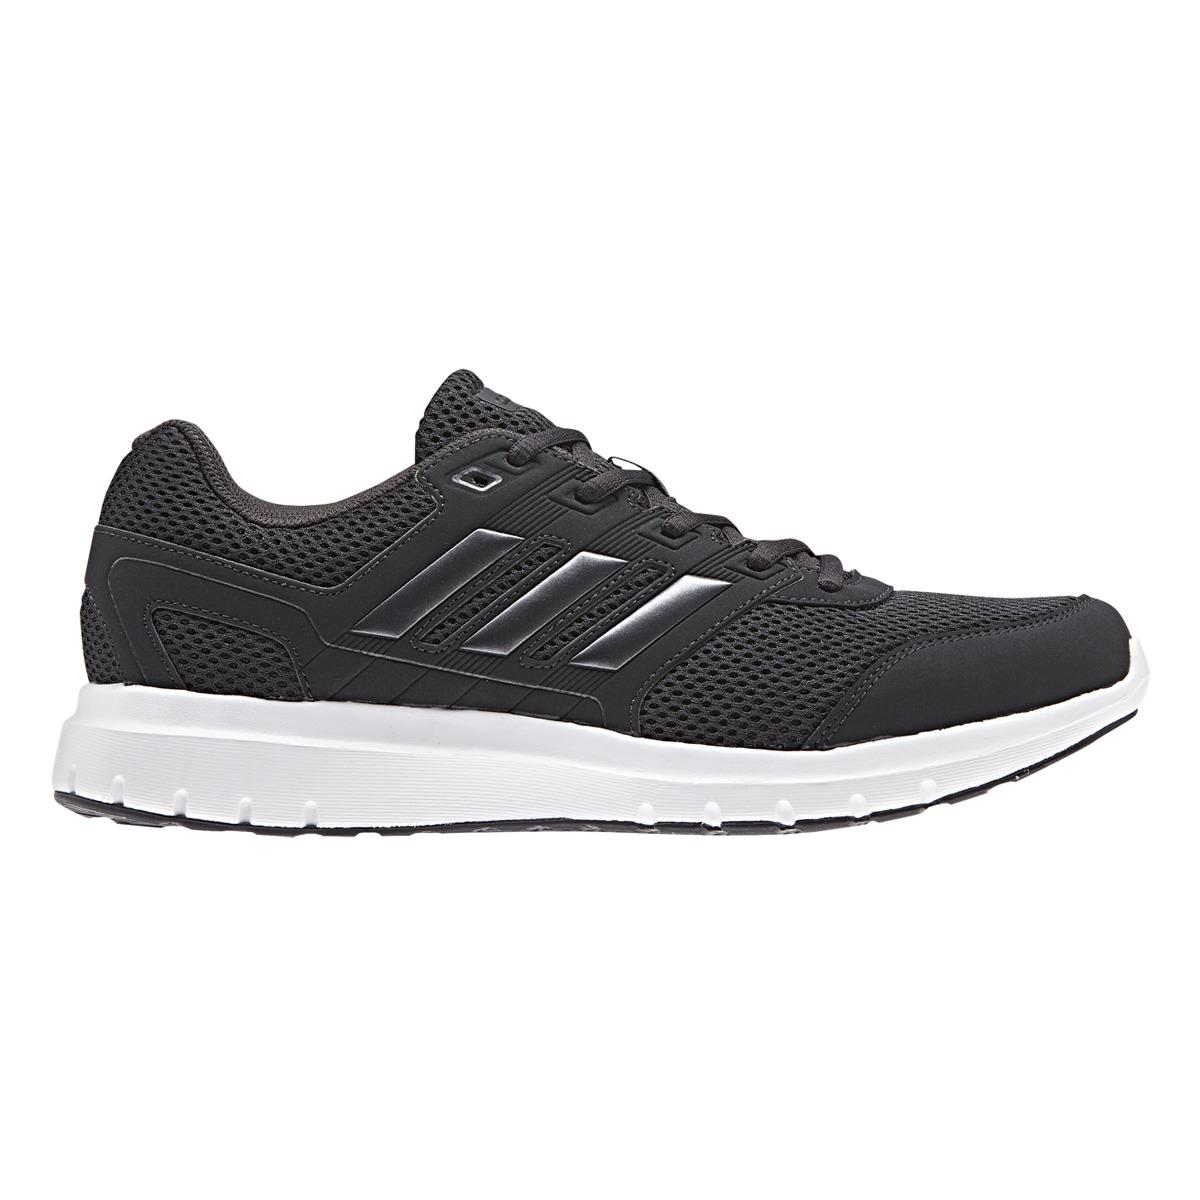 Zapatillas de running de hombre Duramo Lite 2.0 adidas